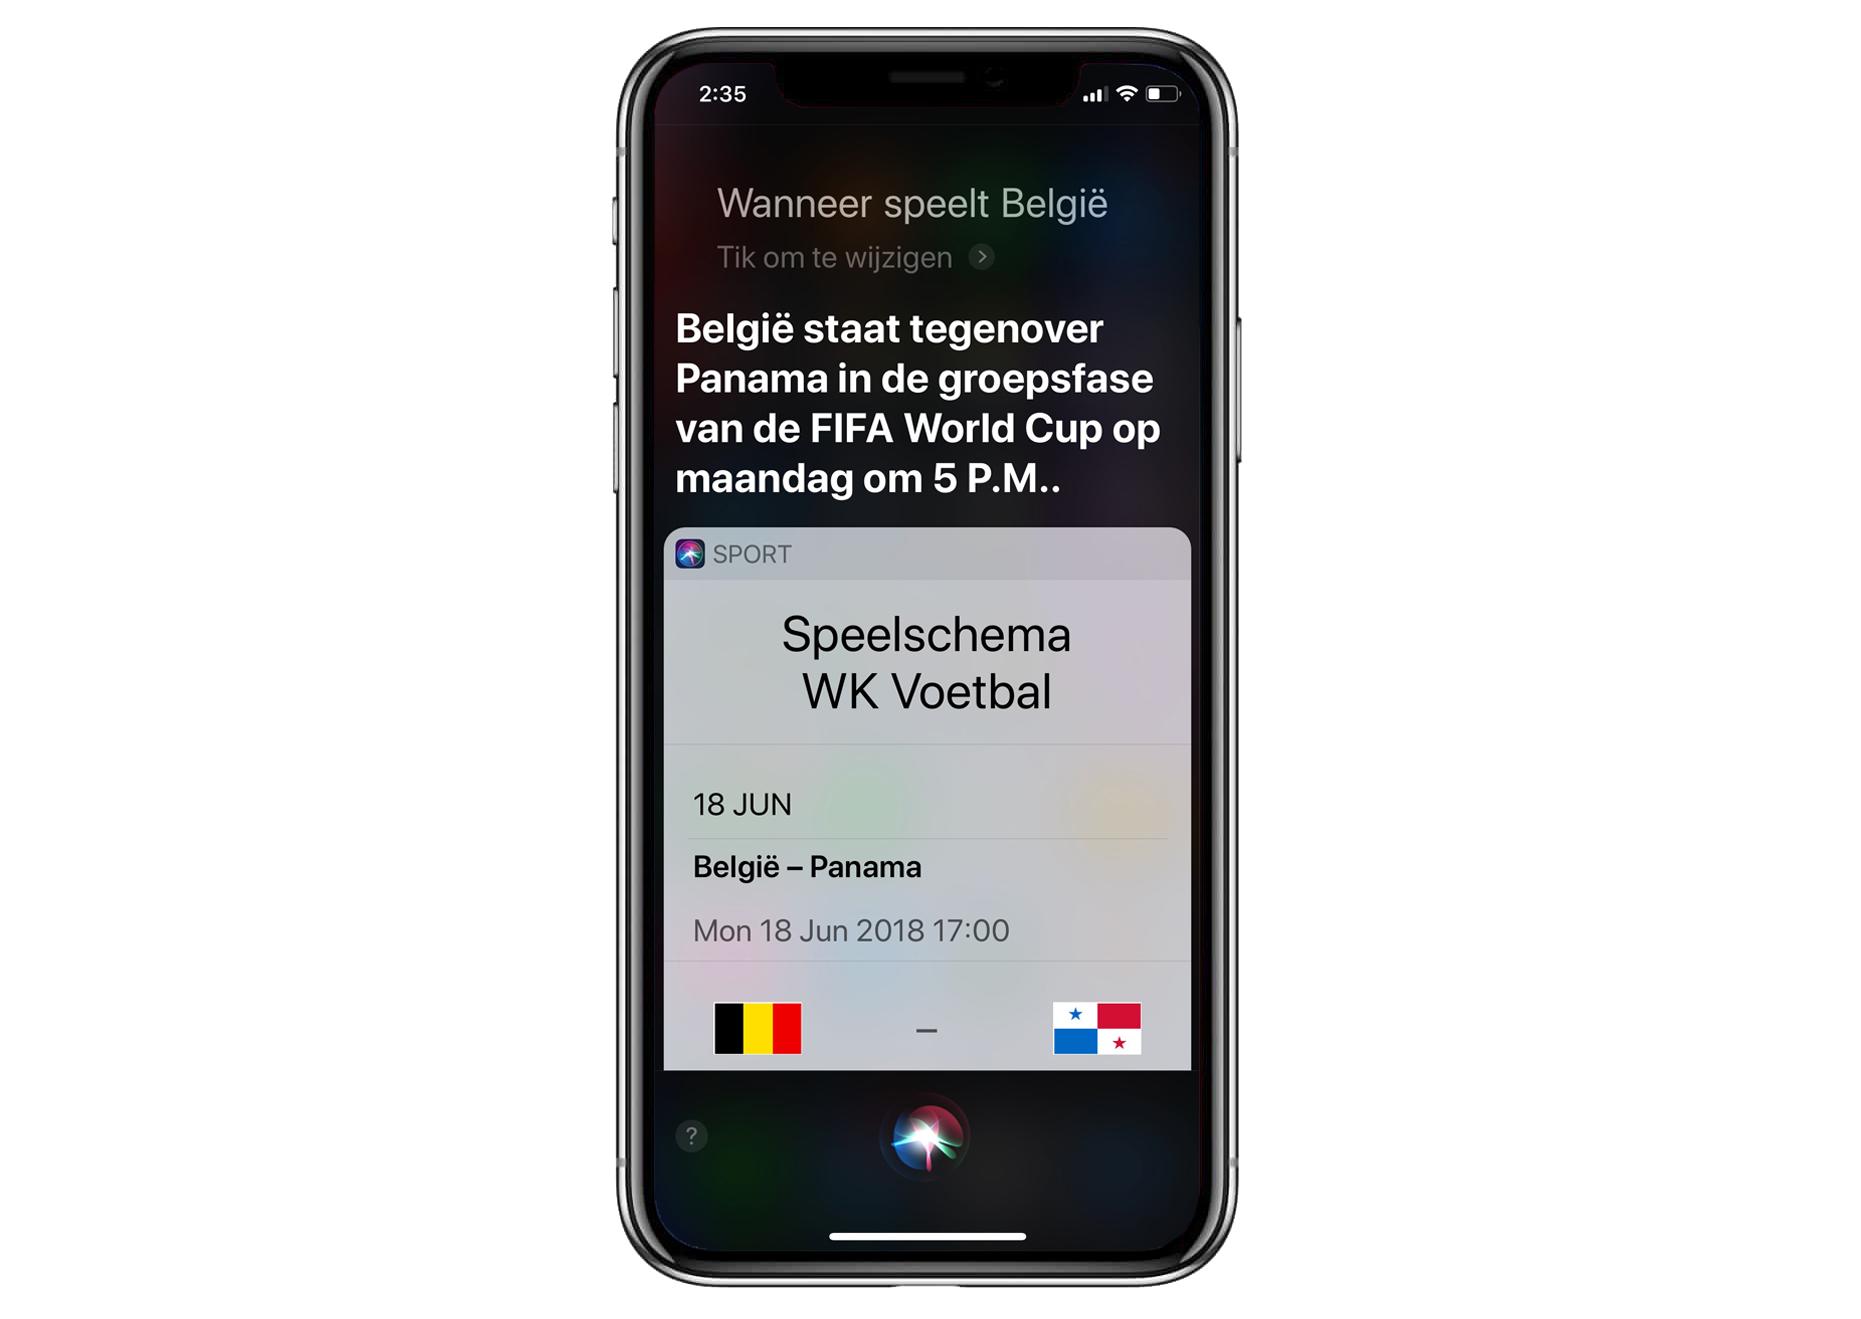 https://www.macfreak.nl/modules/news/images/zArt.Siri-FIFA-Wereldkampioenschap-2018.jpg